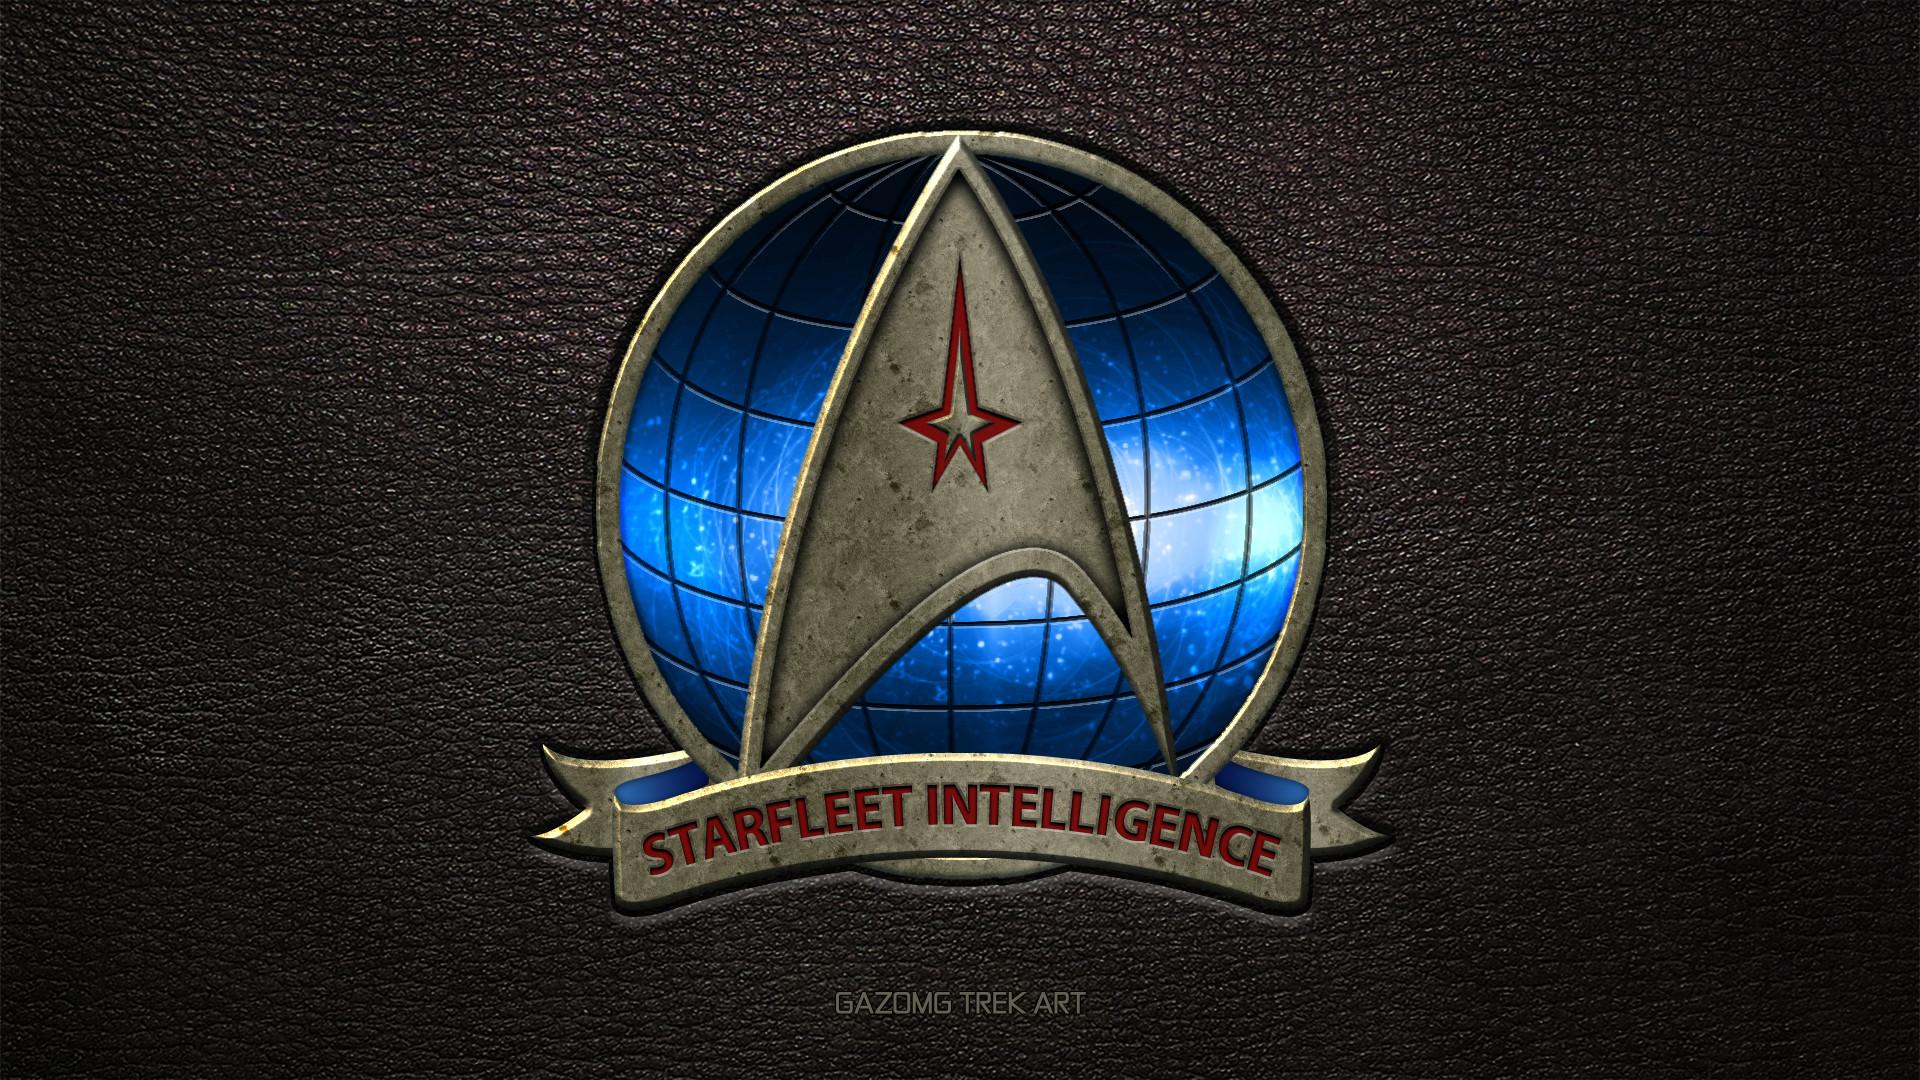 … Starfleet Intelligence Star Trek 2150's (updated) by gazomg